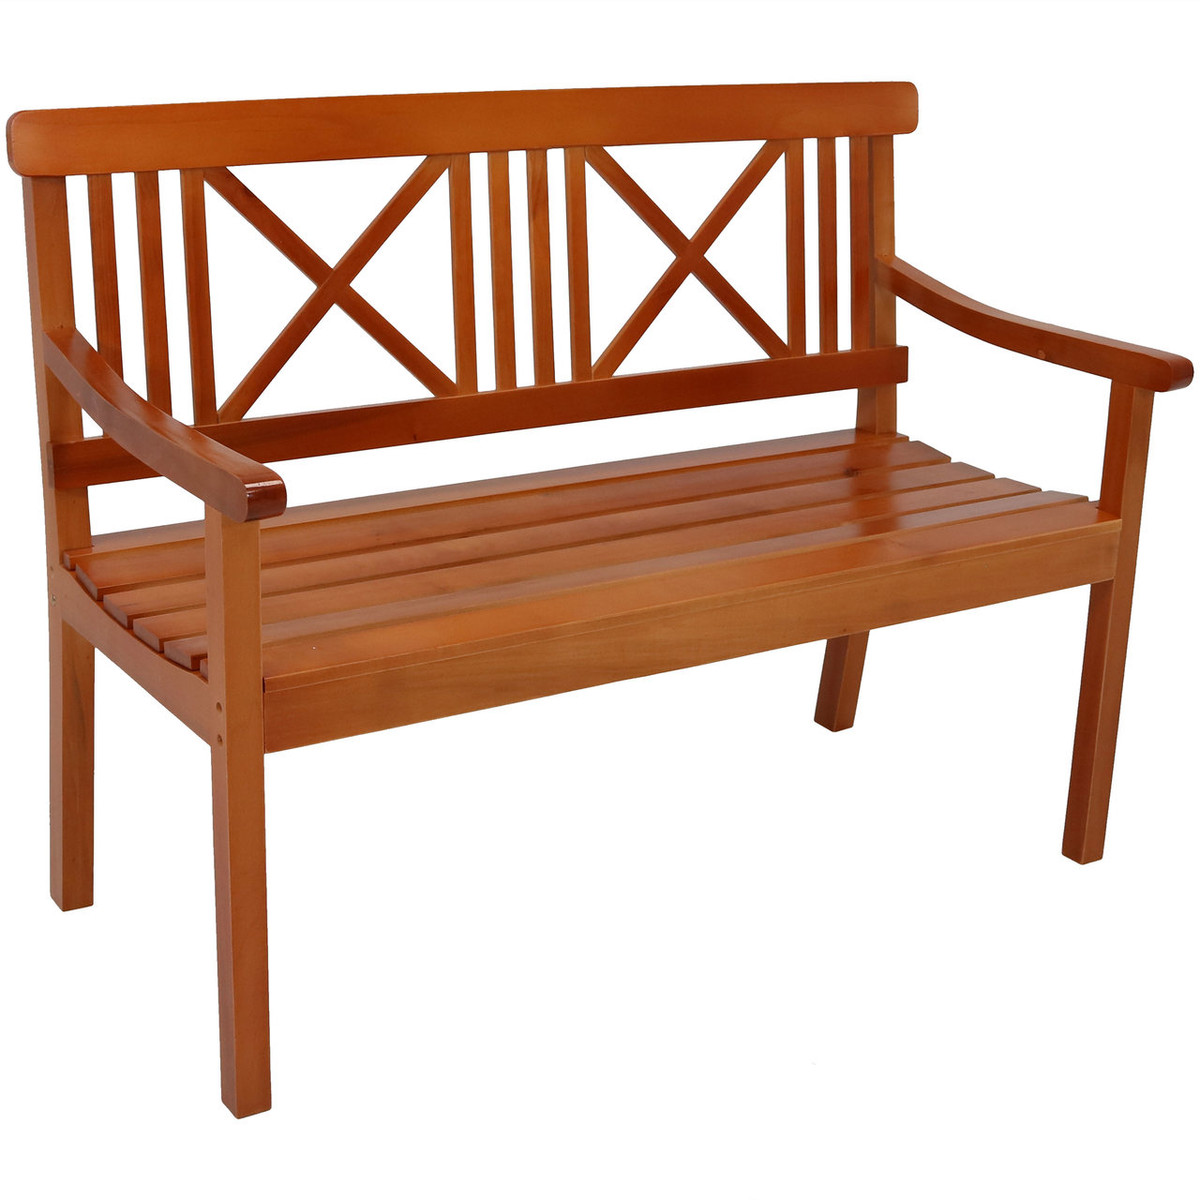 Sensational Sunnydaze 2 Person X Back Outdoor Wood Patio Bench Machost Co Dining Chair Design Ideas Machostcouk